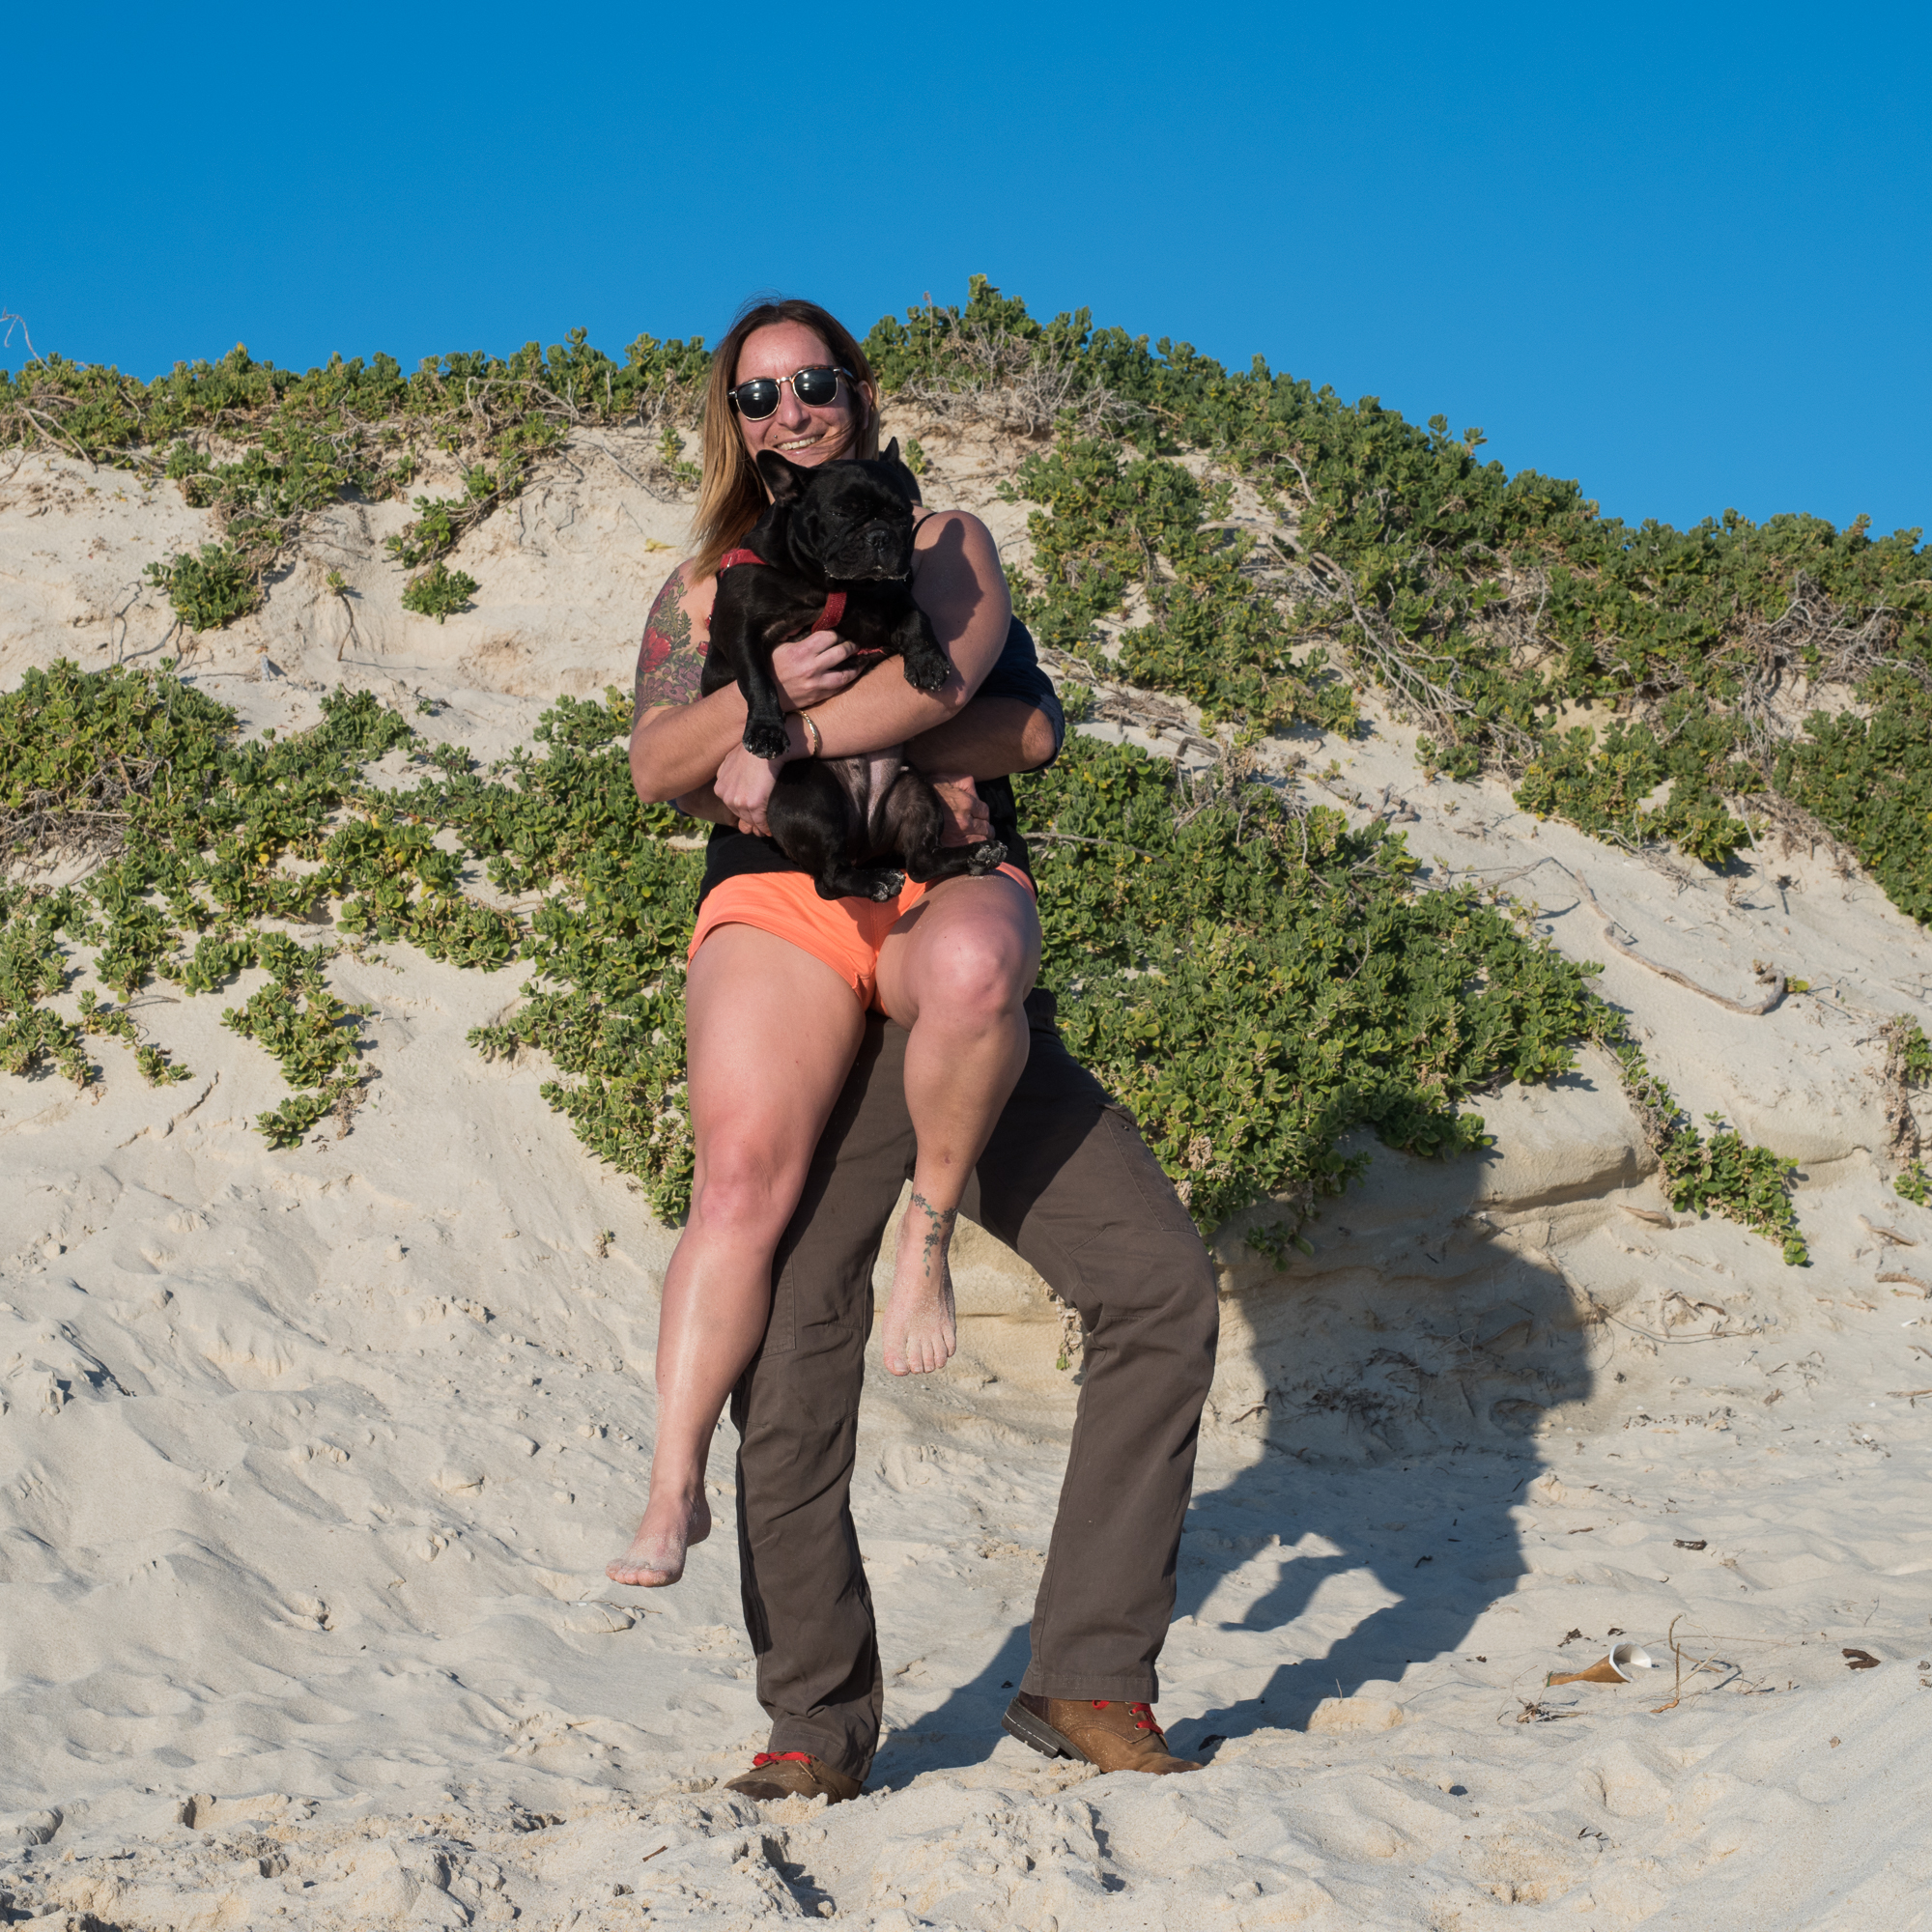 Dog Beach Perth - Doggy paddle